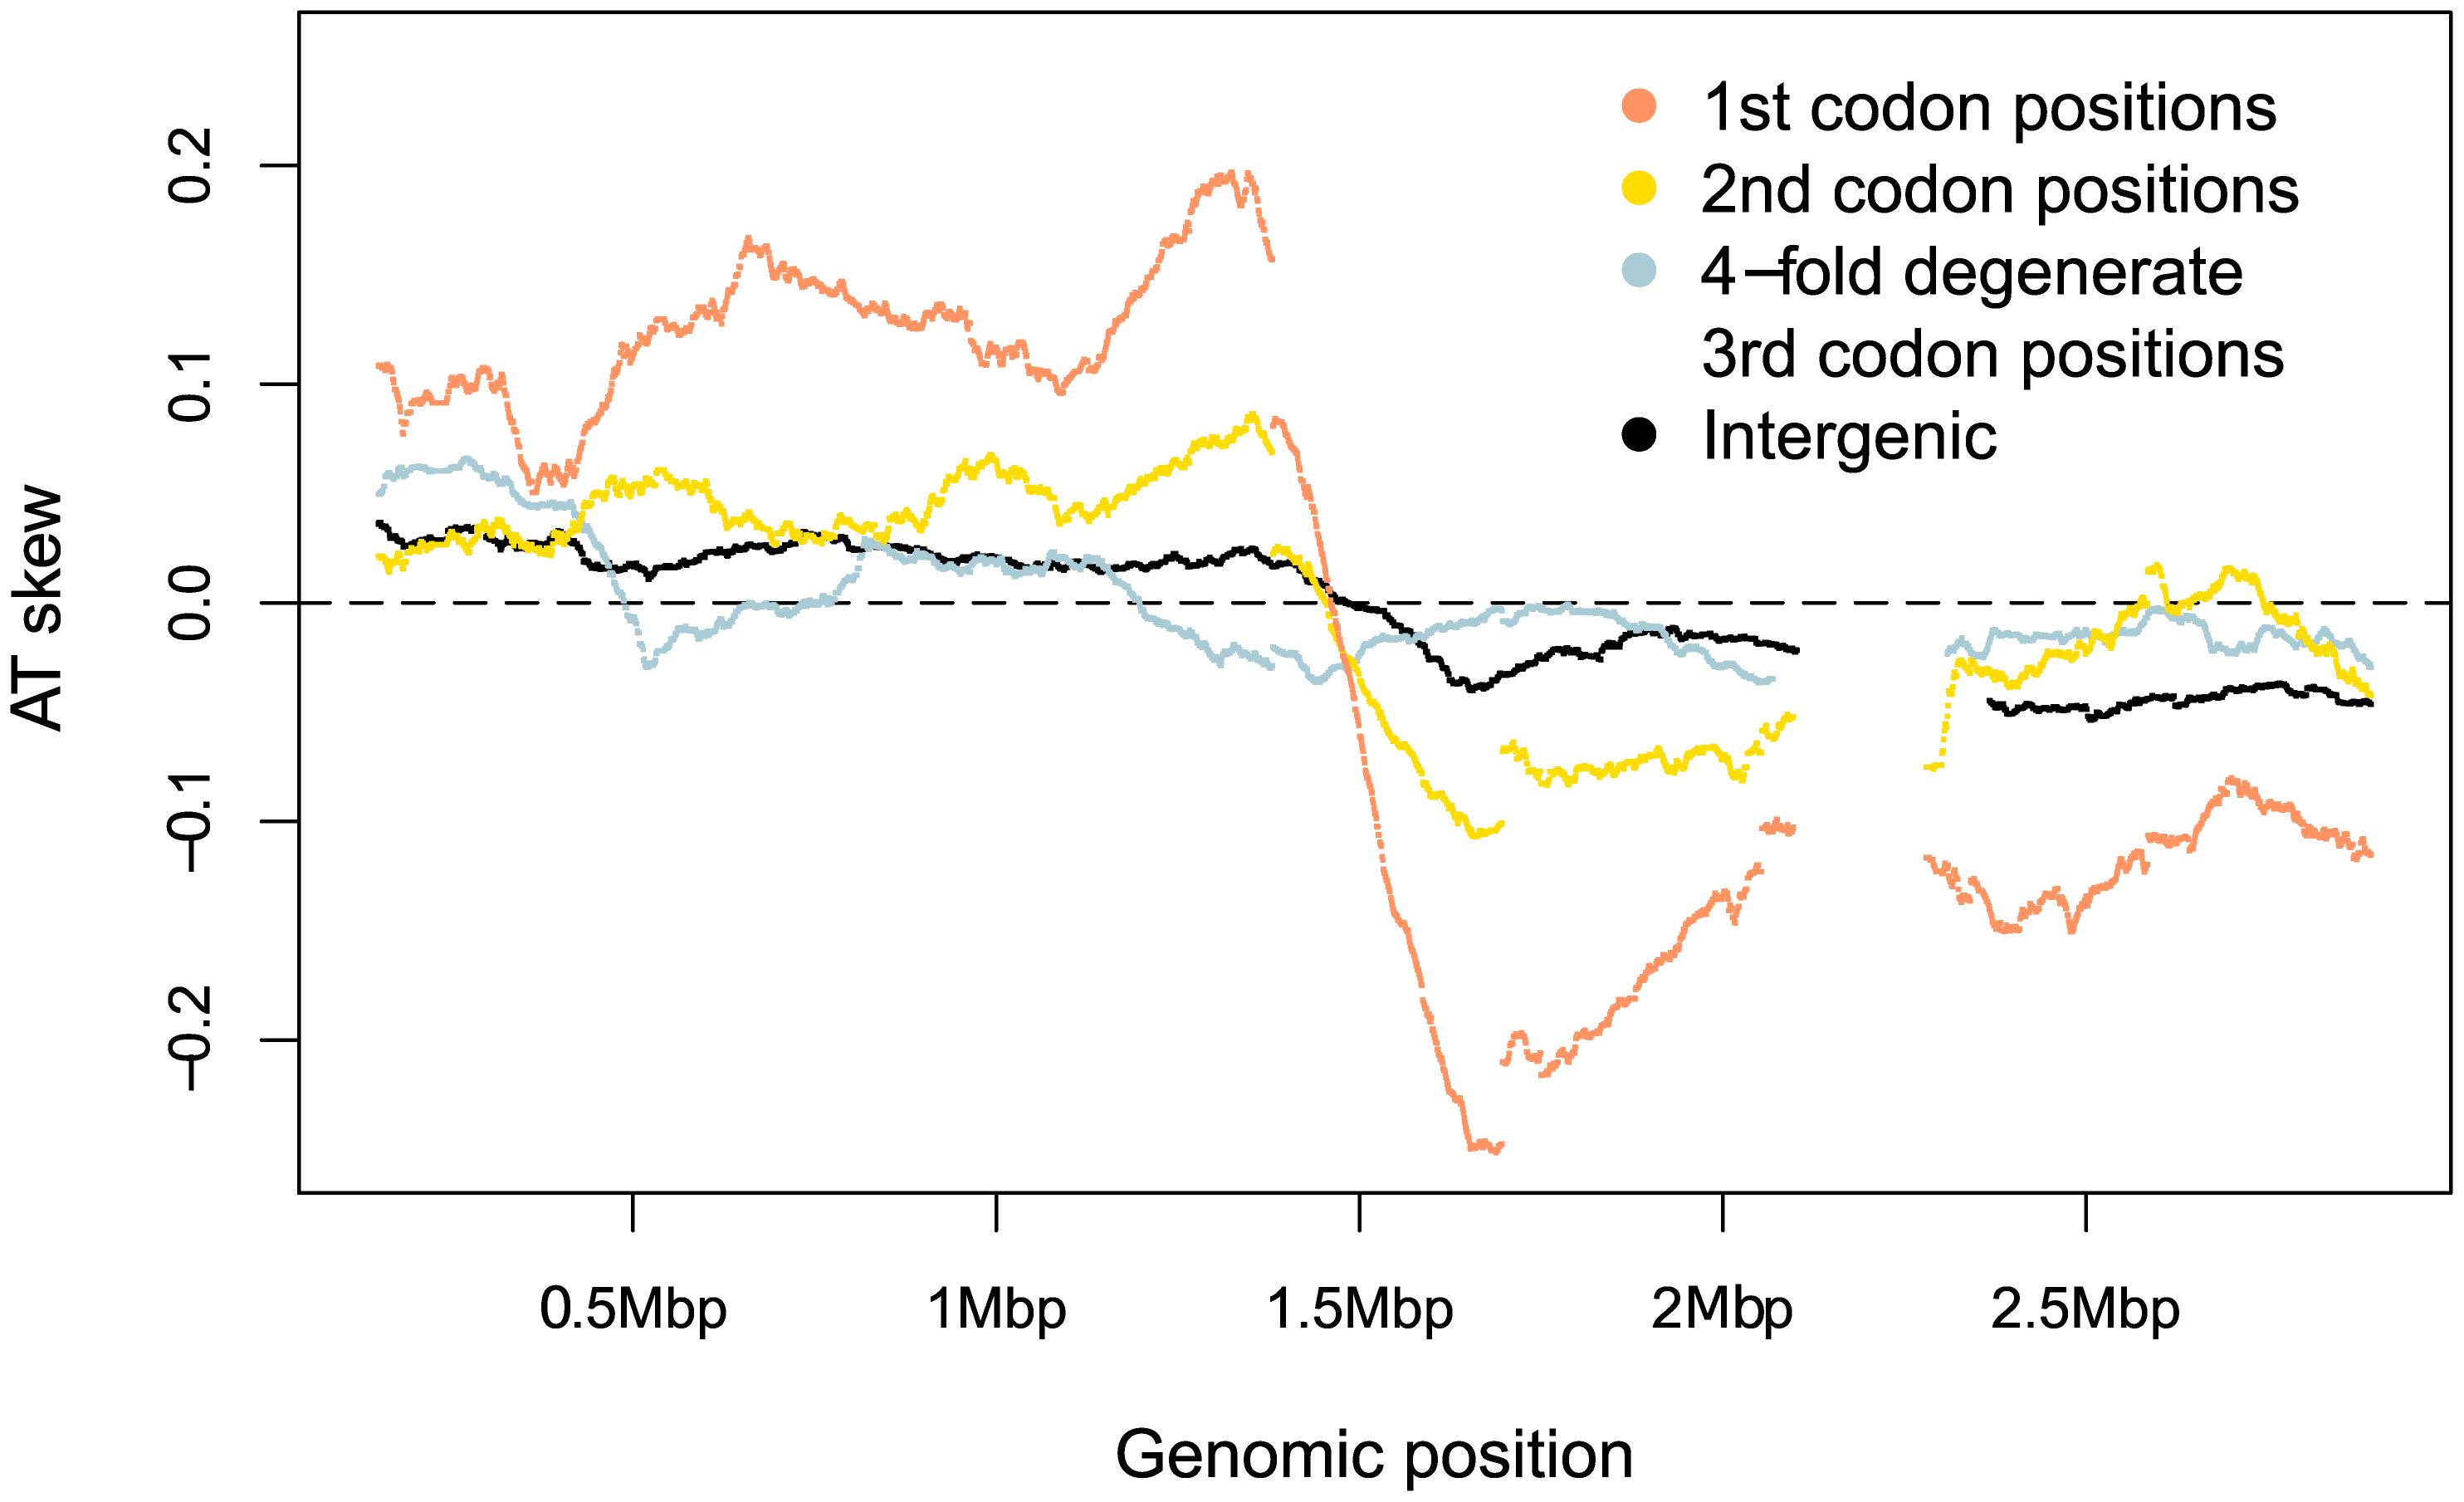 <i>S. aureus</i> AT skews in different sites along the genome.